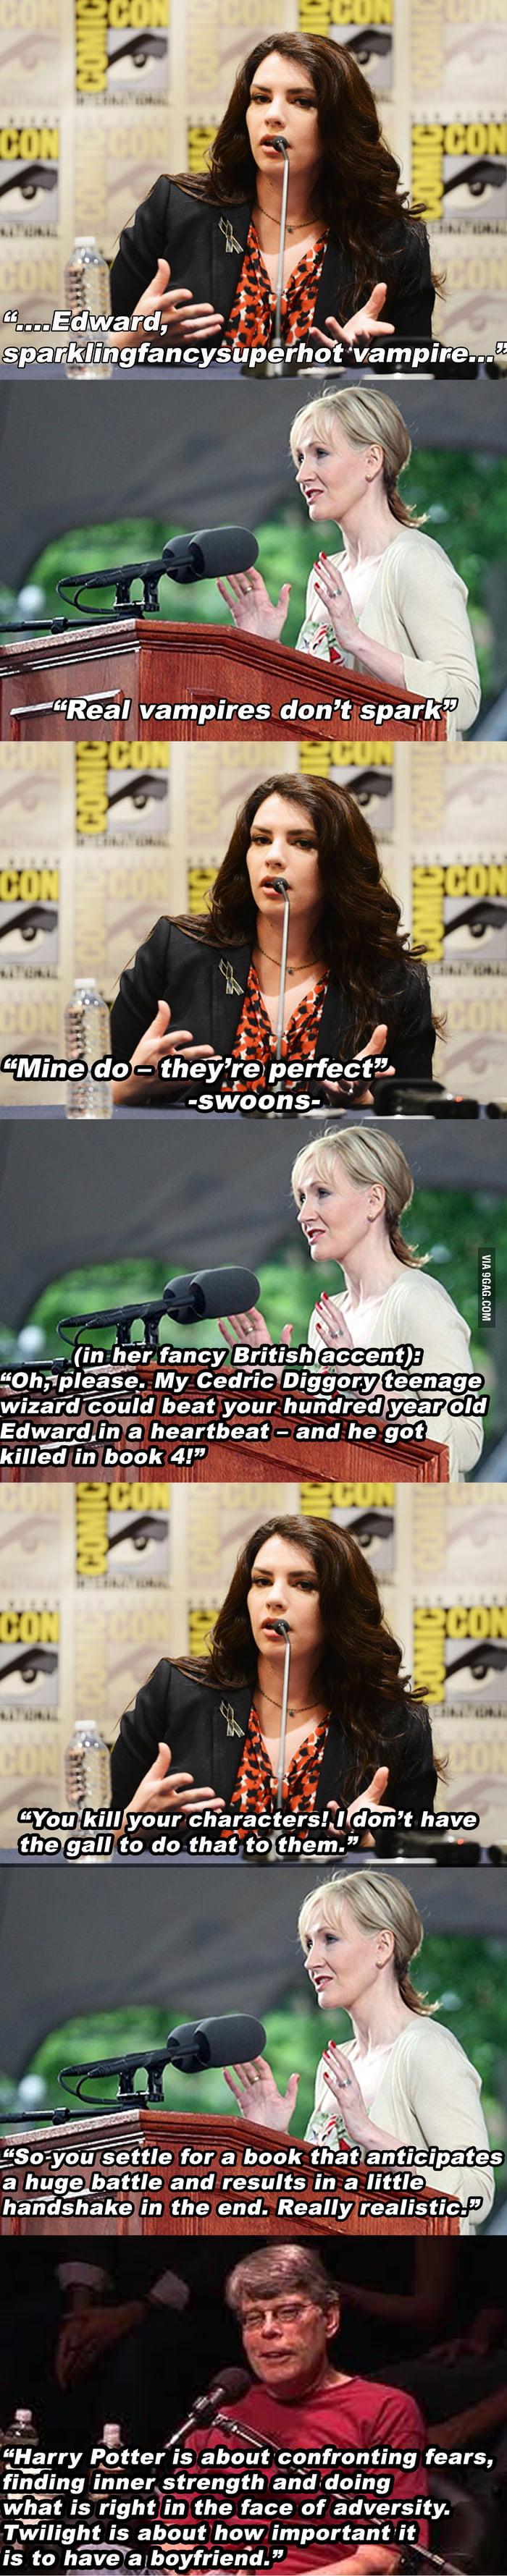 Stephanie Meyer and J.K. Rowling debate.